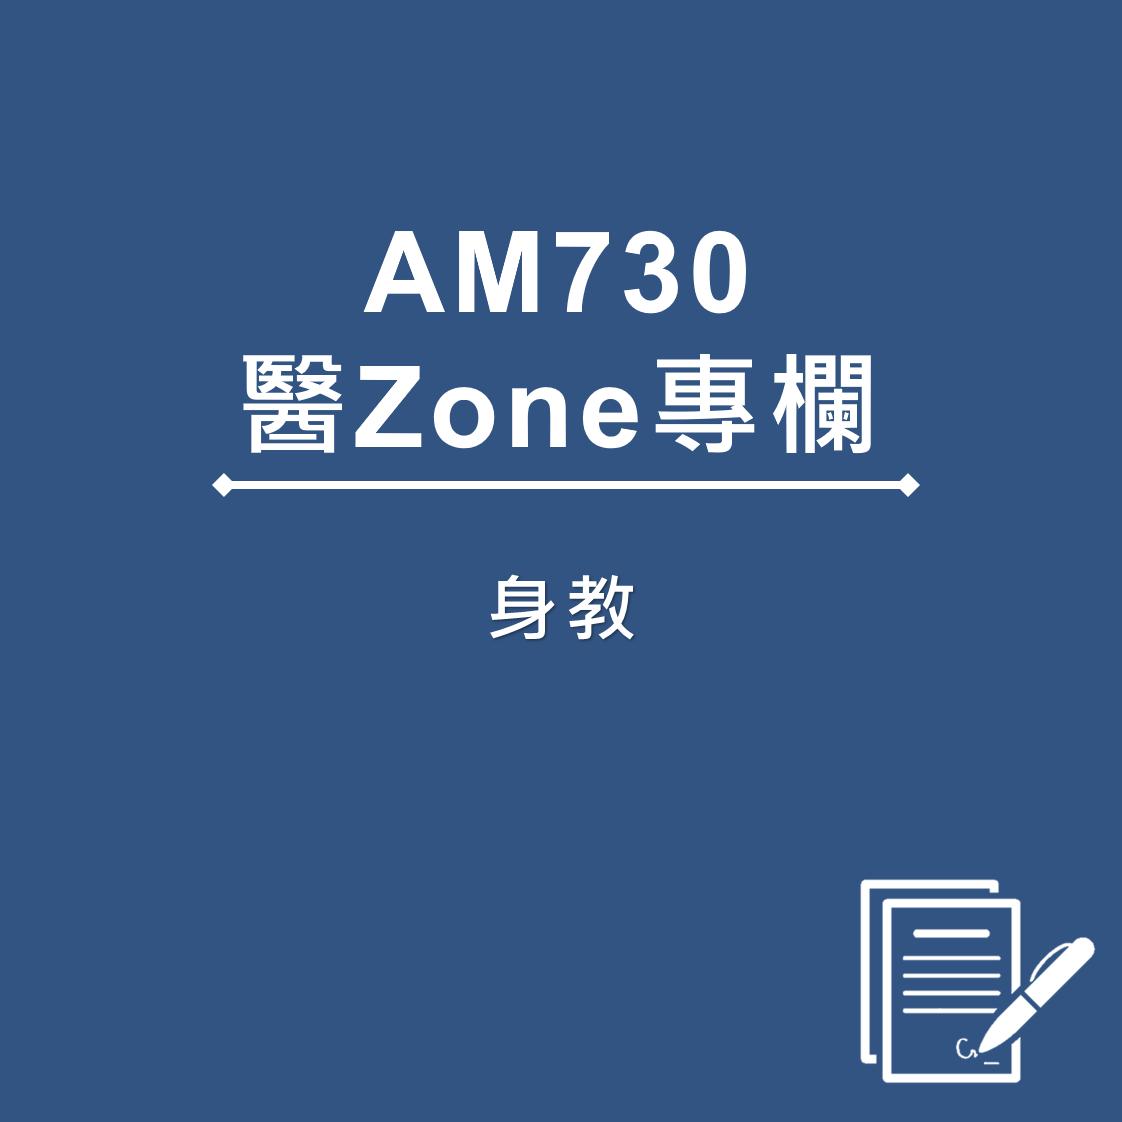 AM730 醫Zone 專欄 - 身教